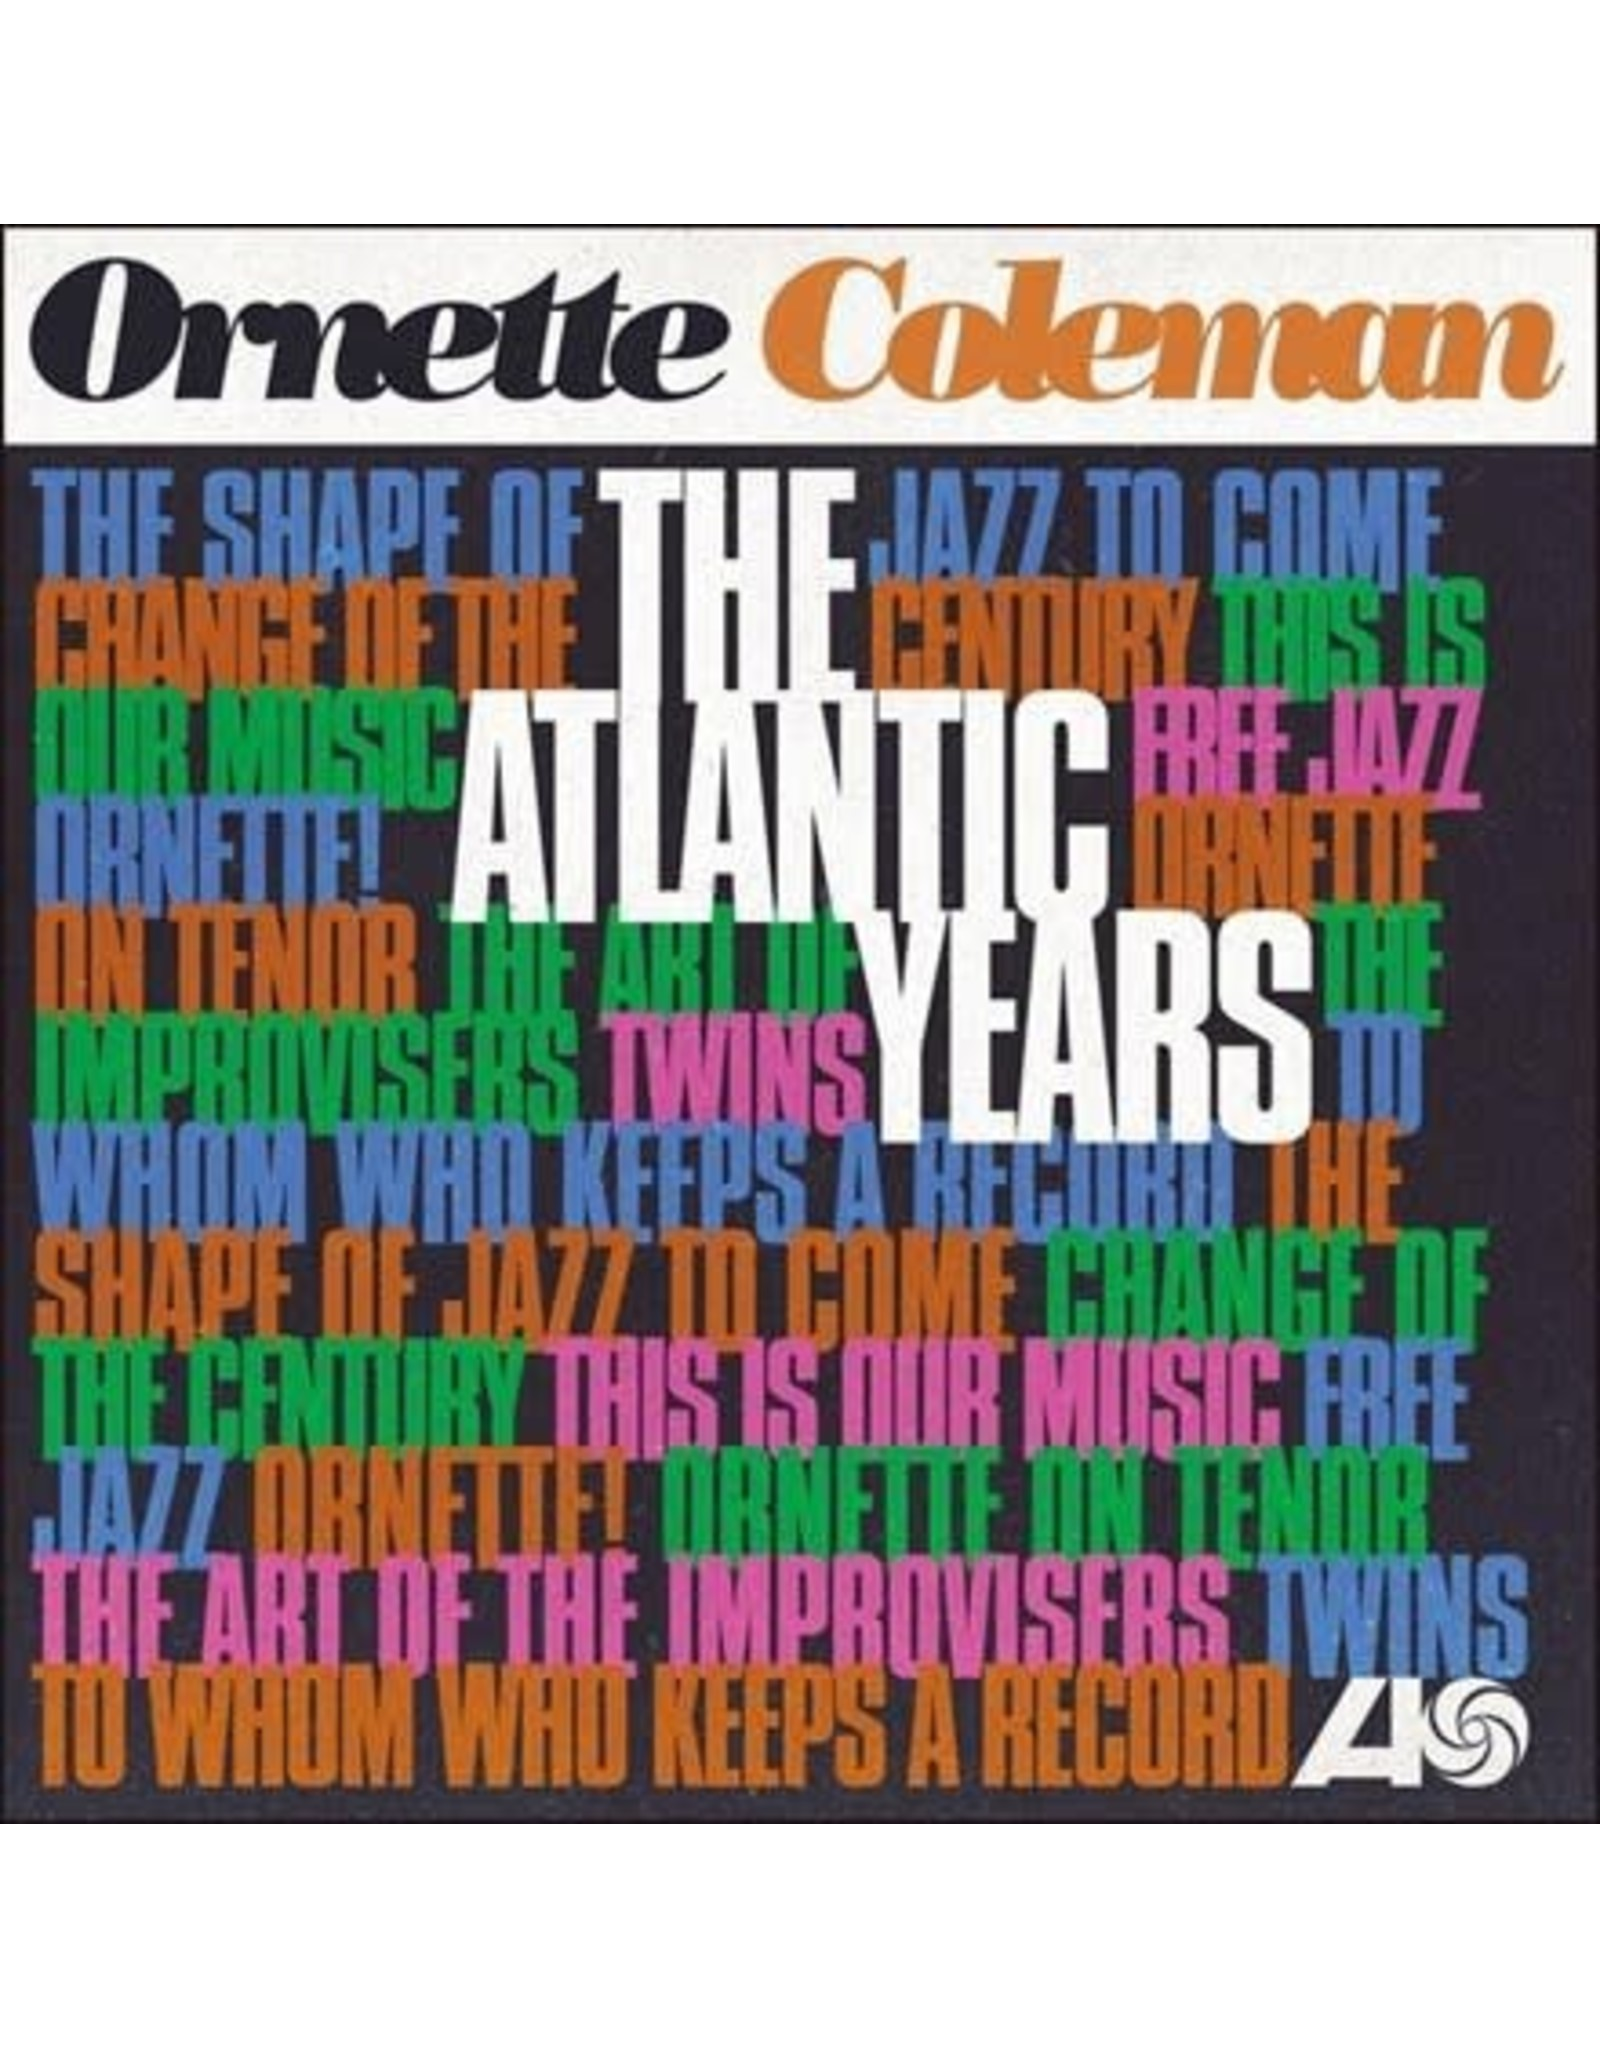 Rhino Coleman, Ornette: The Atlantic Years 10 LP BOX